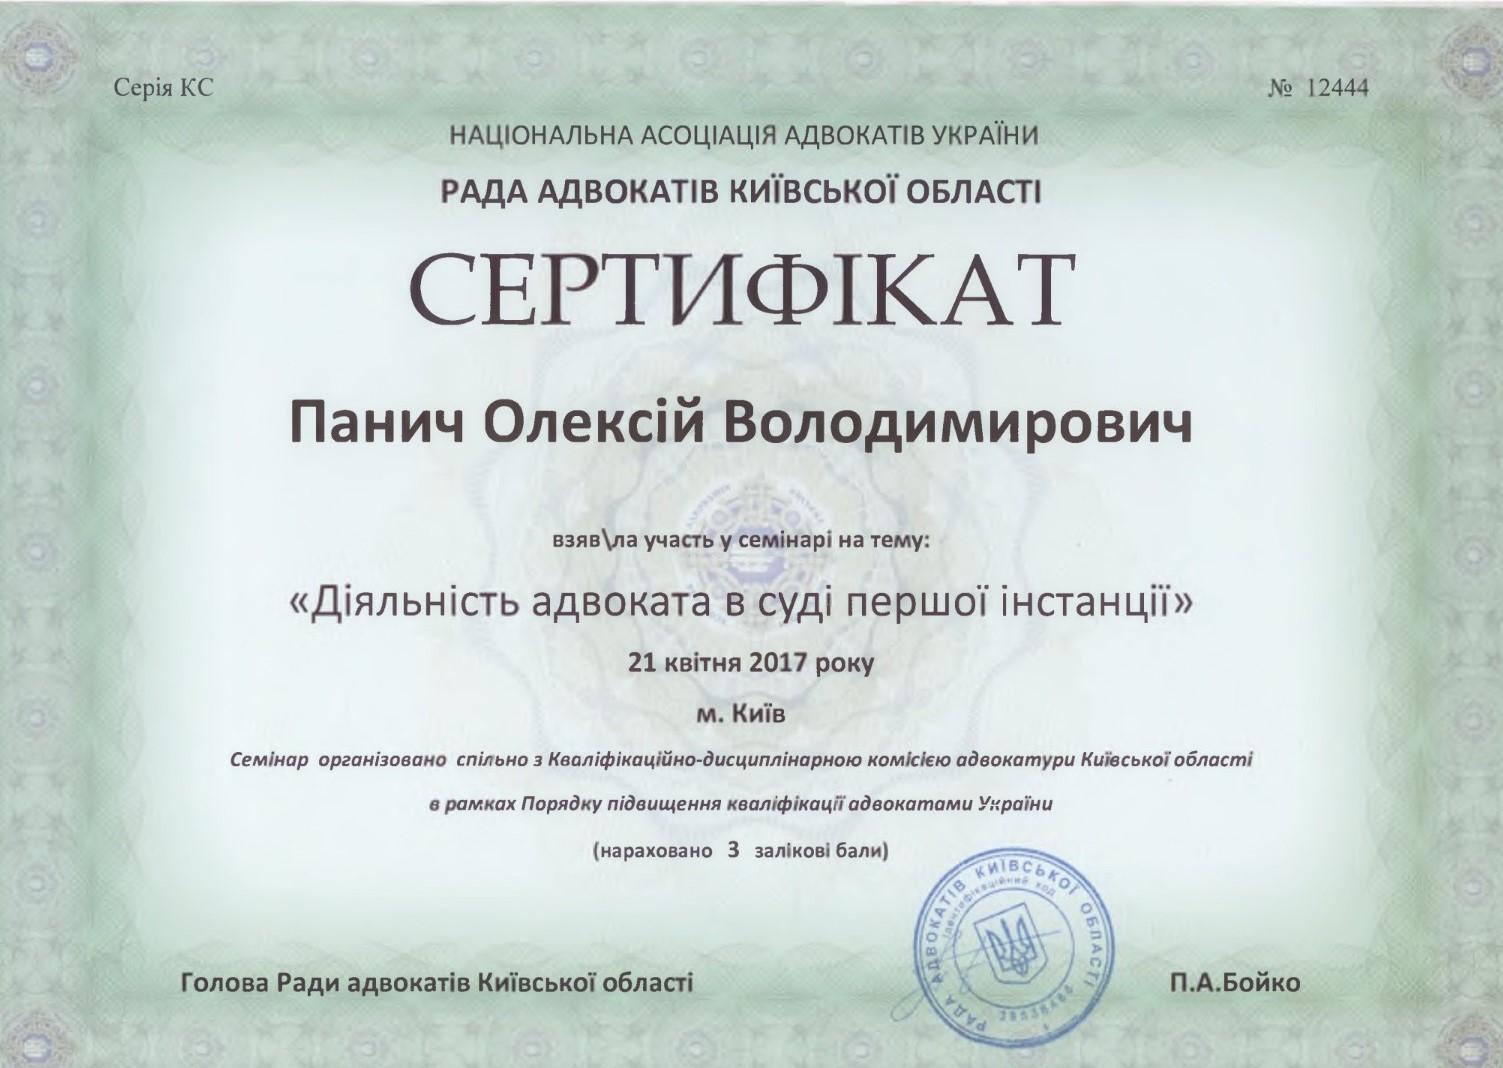 seminar 21.04.17 Panych